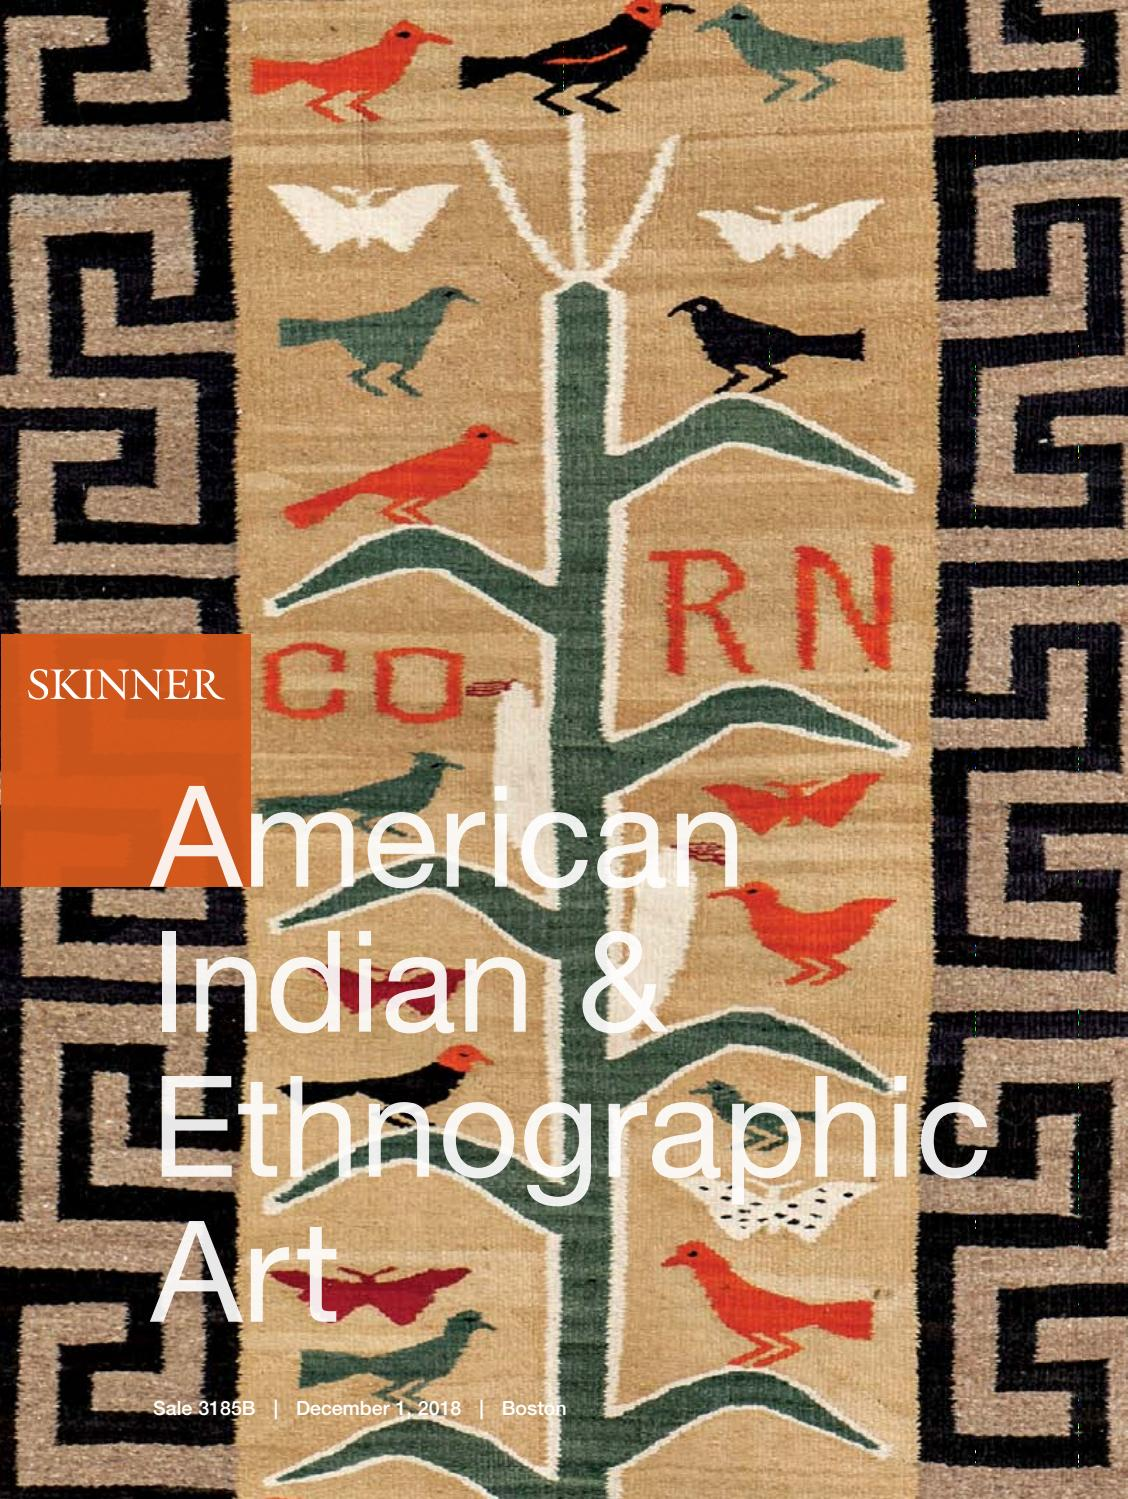 American Indian & Ethnographic Art | Skinner Auction 3185B